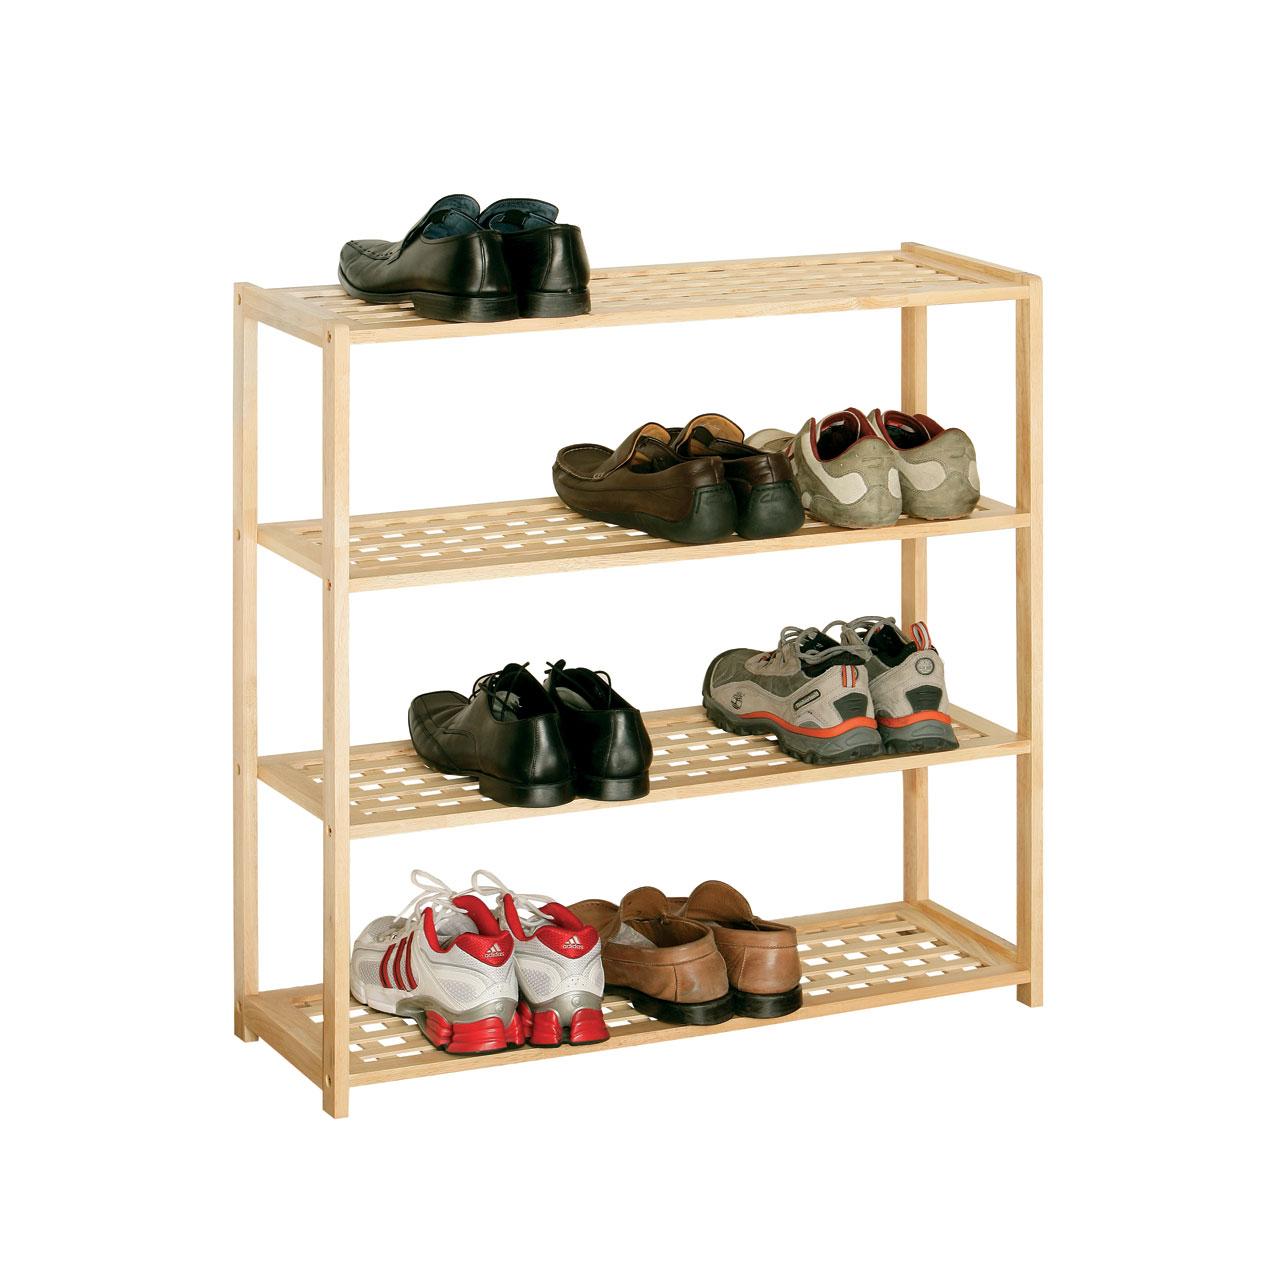 Hallway Natural Tropical Havea Wood Shoe Storage Rack Organizer 4 Tier Stand